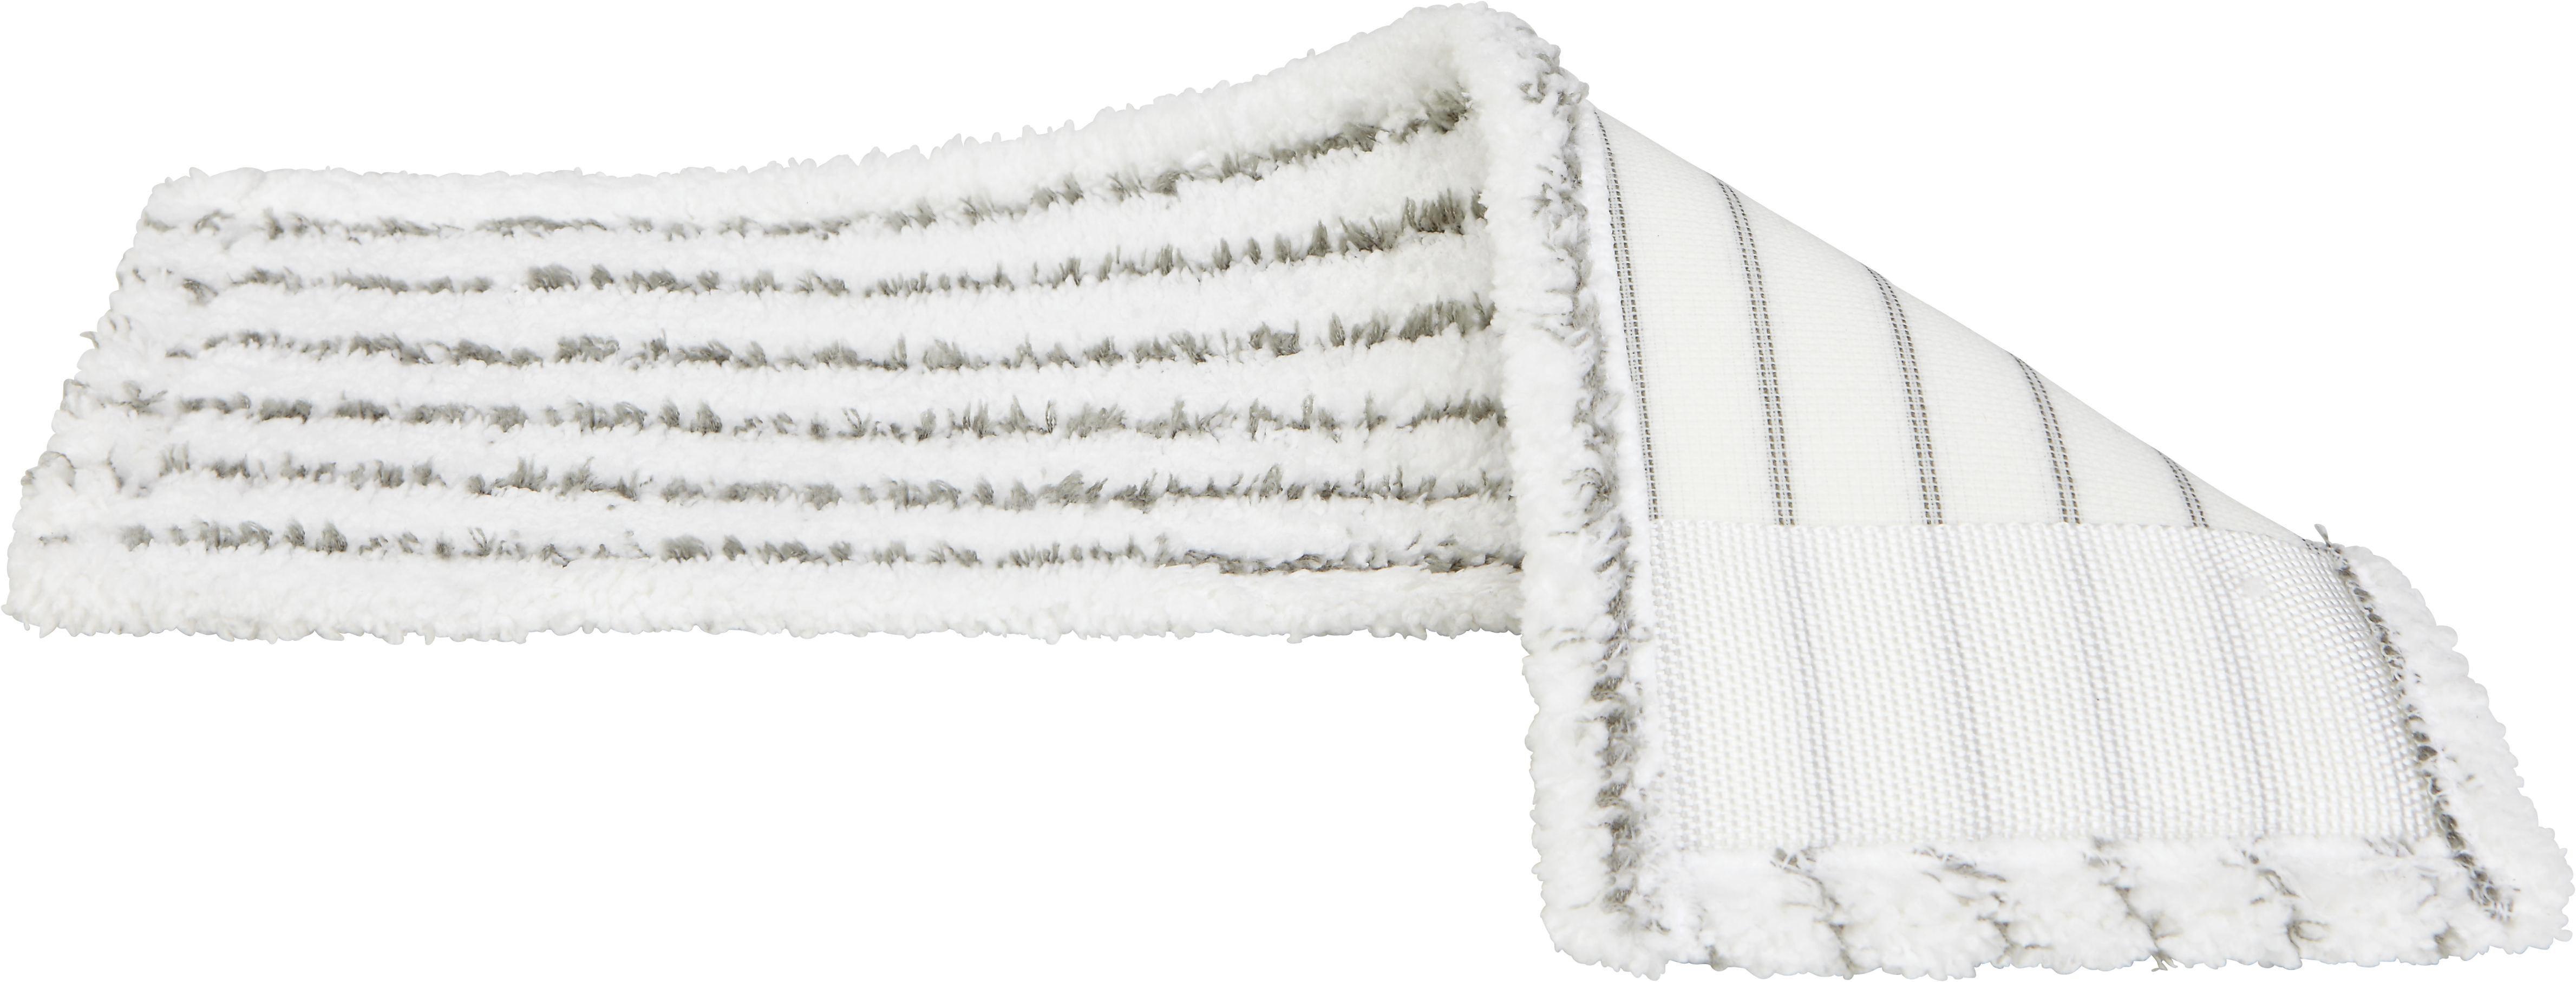 Wischbezug Struppi - Anthrazit, Textil (14/42cm) - MÖMAX modern living